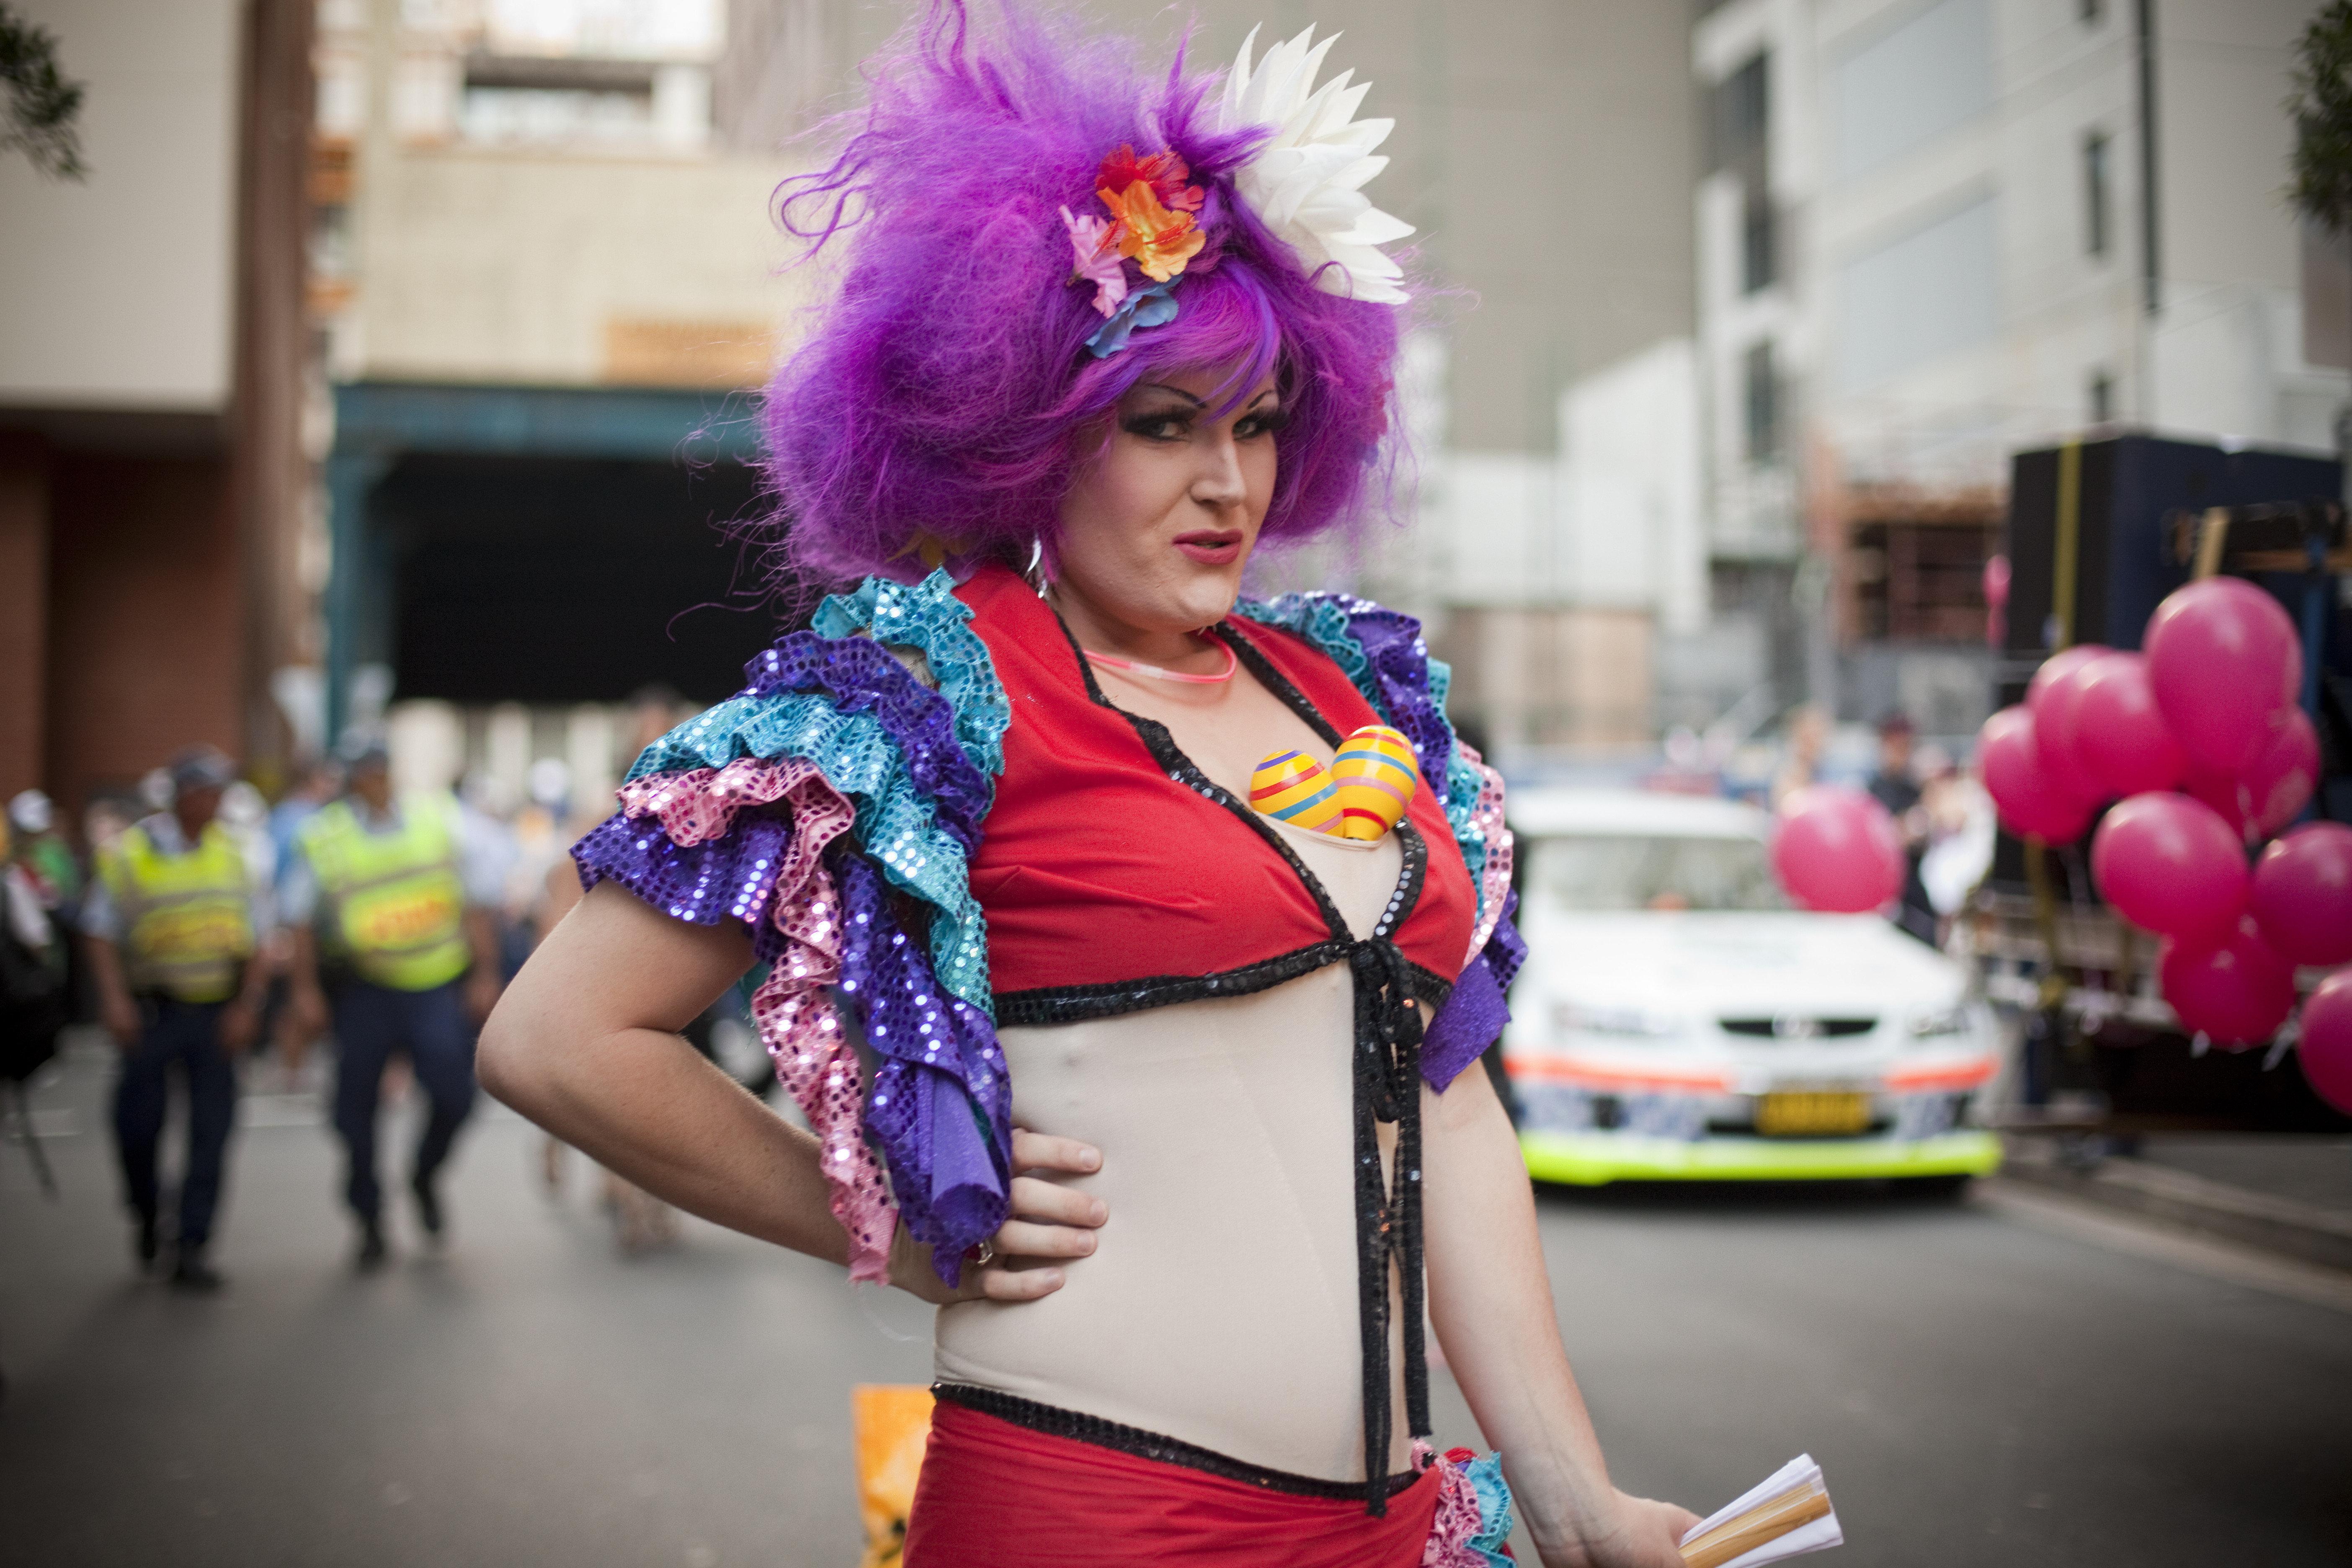 Remarkable idea Erotic drag queen opinion